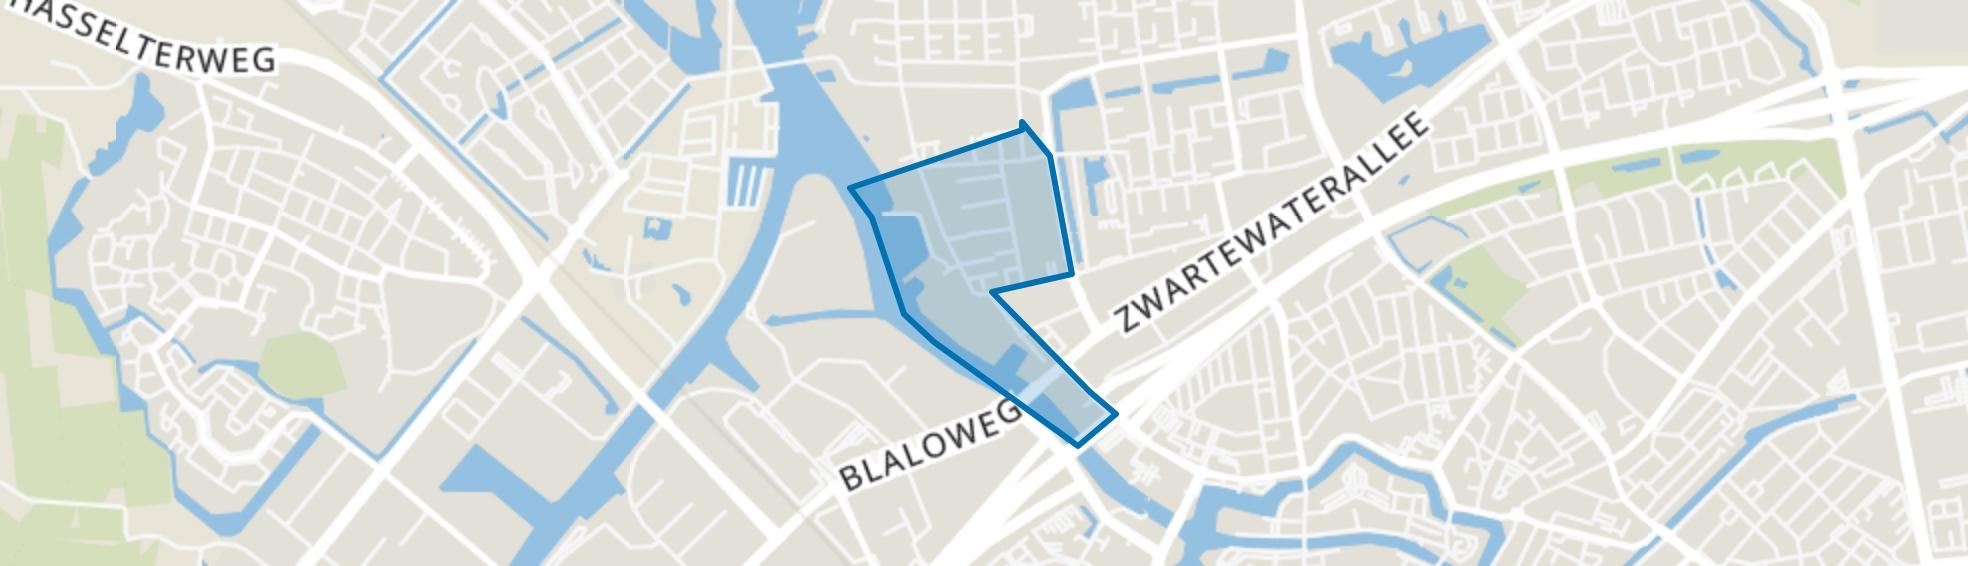 Holtenbroek I, Zwolle map